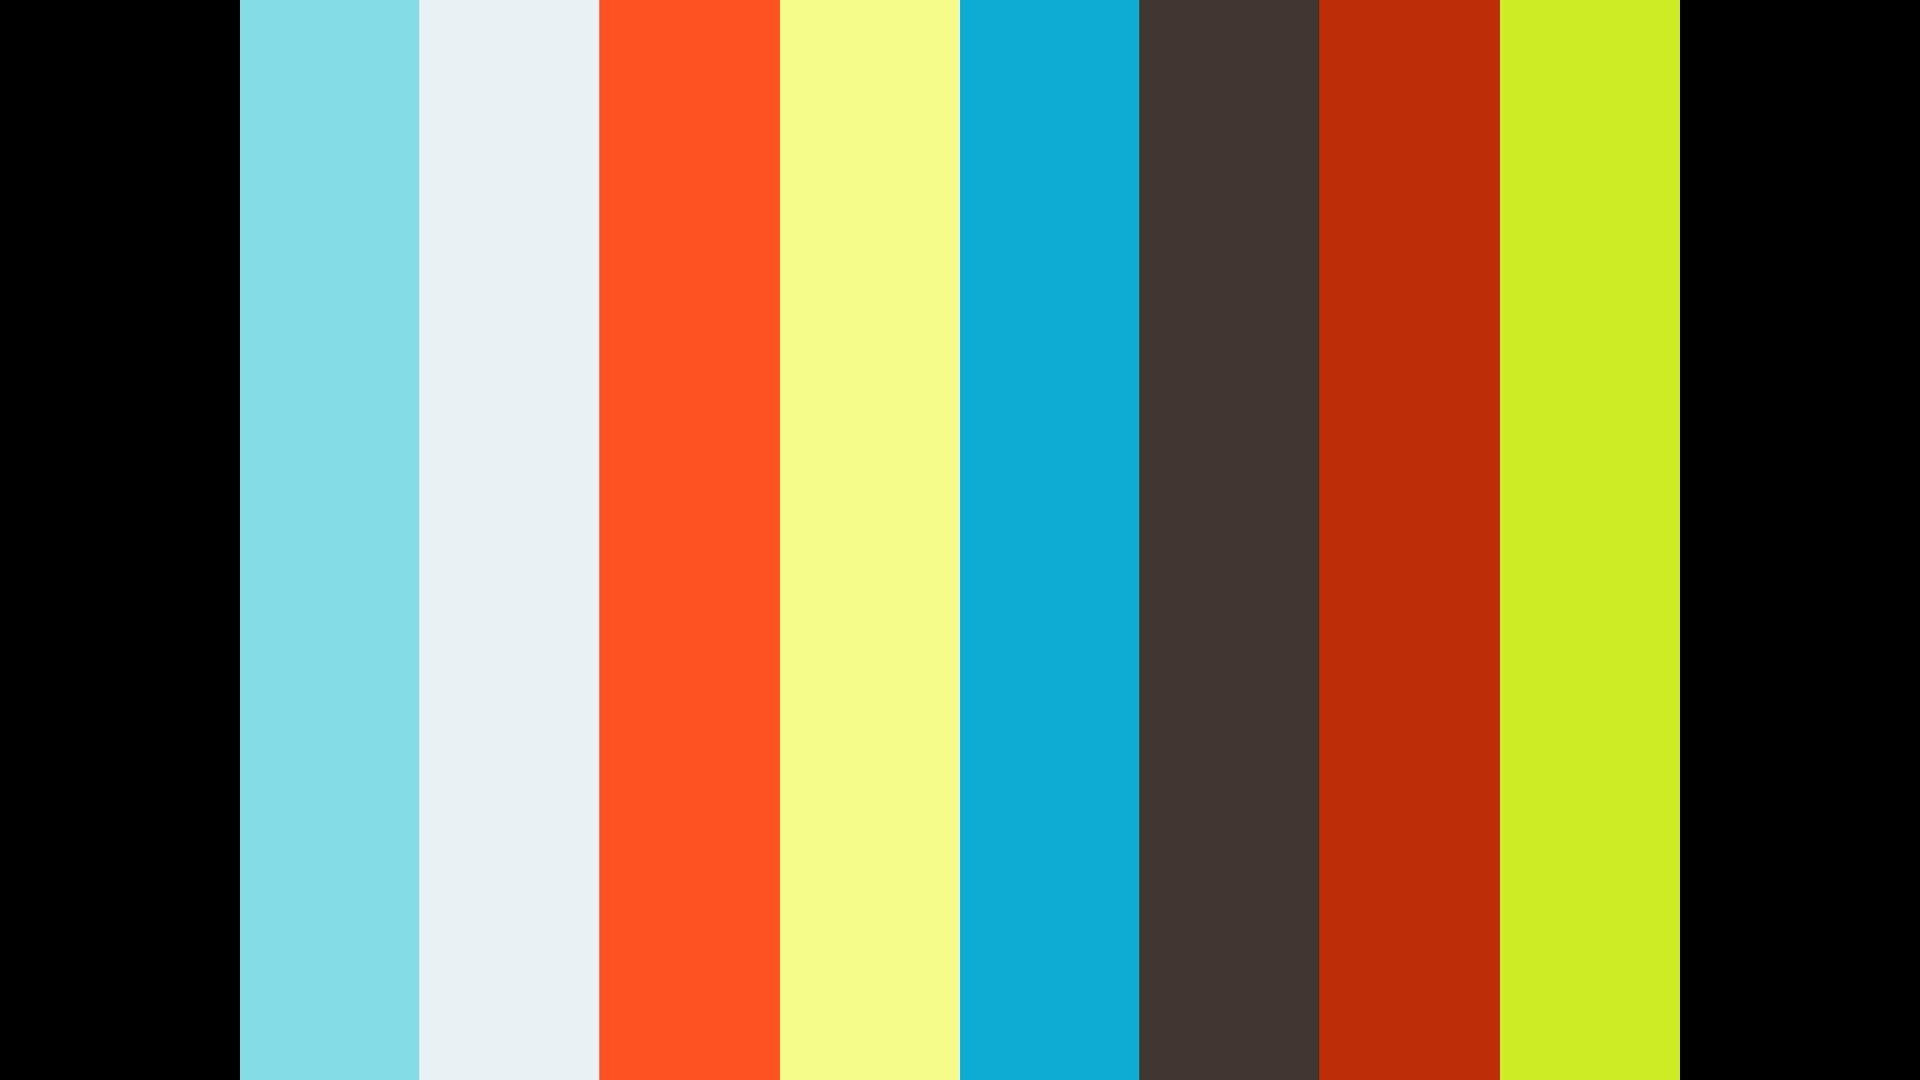 StudioMadison Silhouette reopen 2020. május 15.